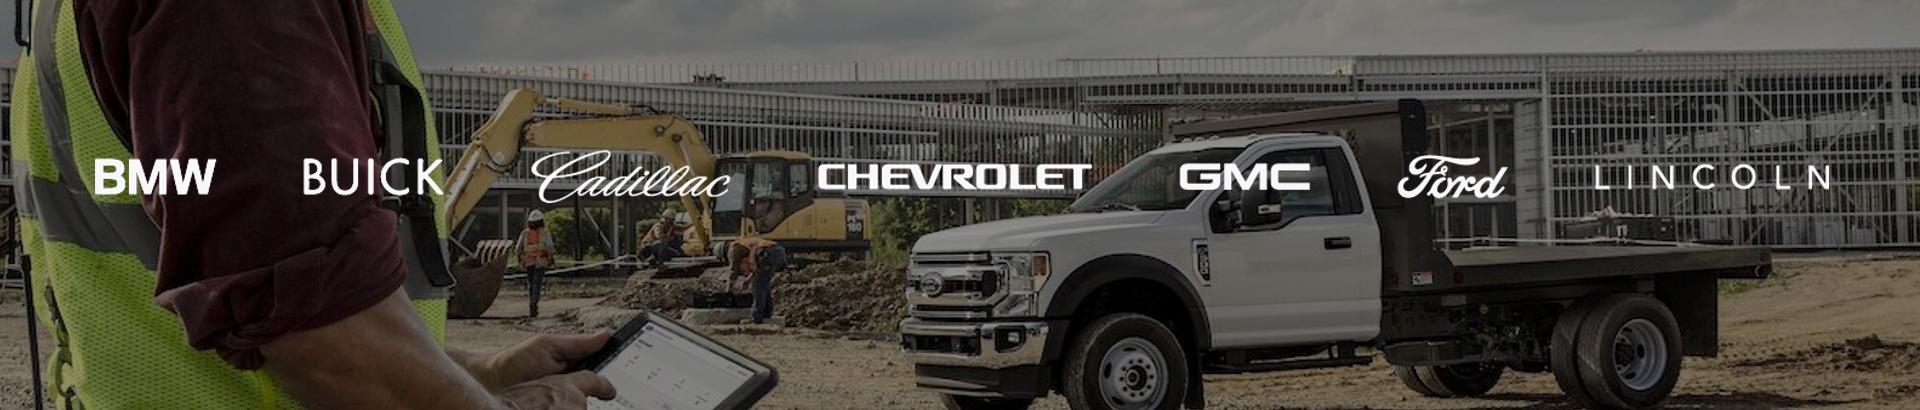 Sewell Fleet vehicles and work trucks